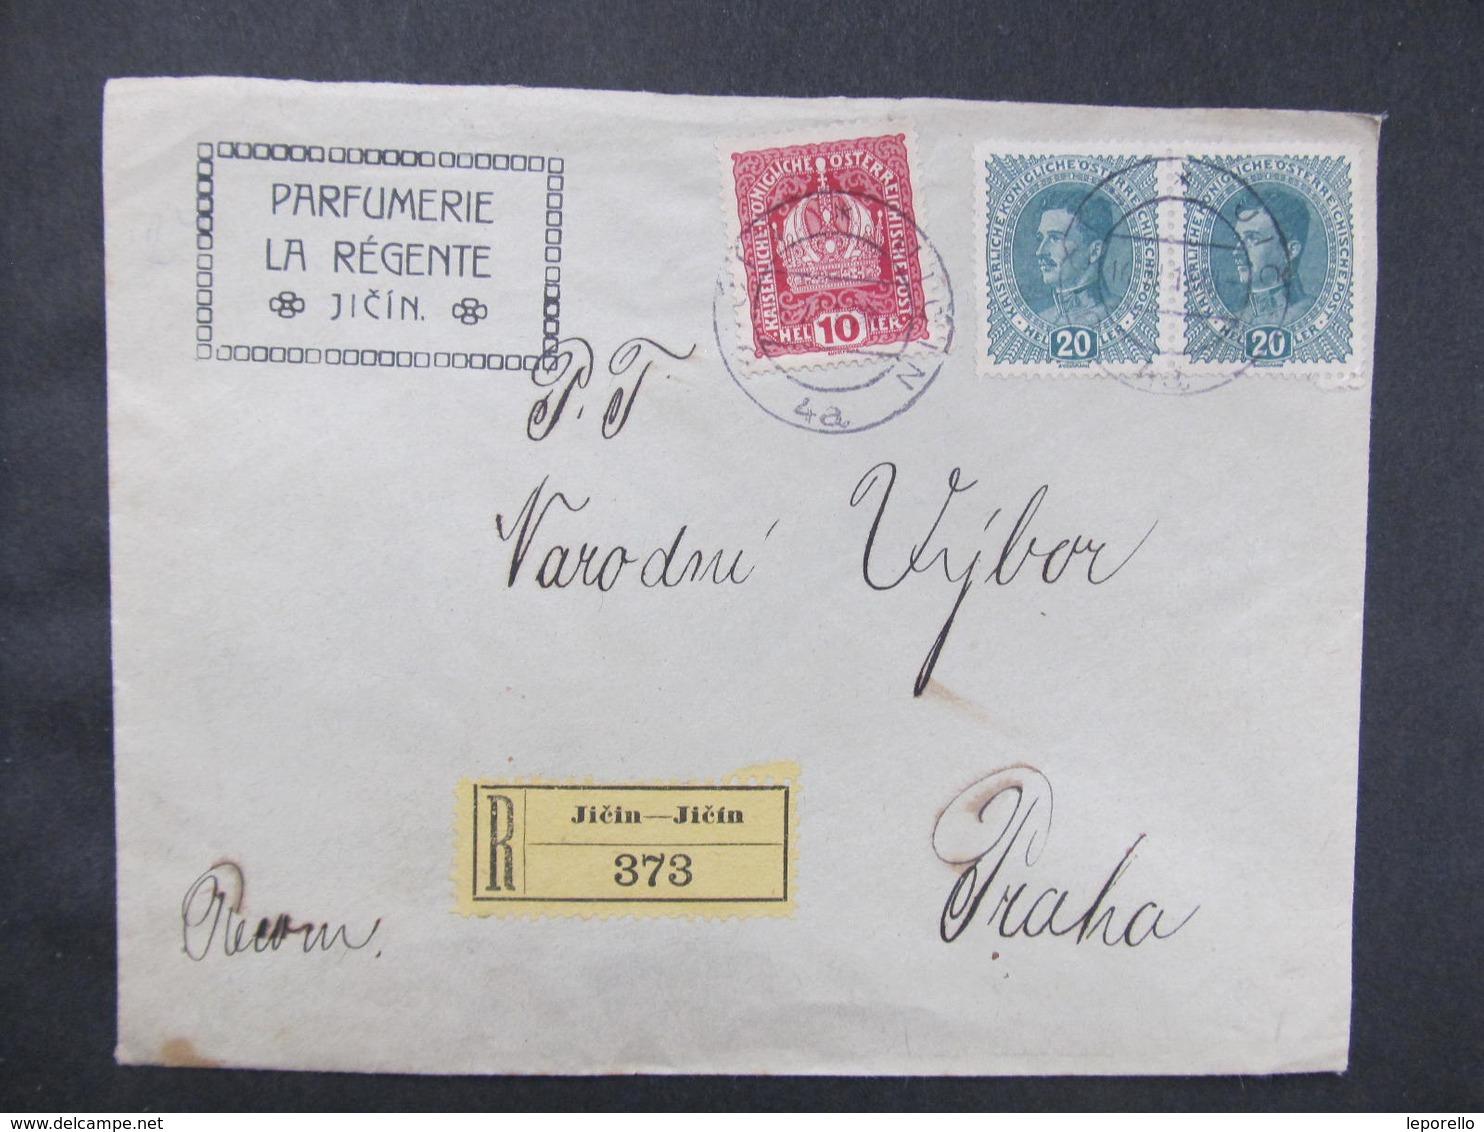 R-BRIEF Jicin - Praha Parfumerie La Regente 16.12.1918 Mitläufer   //  D*36671 - Briefe U. Dokumente